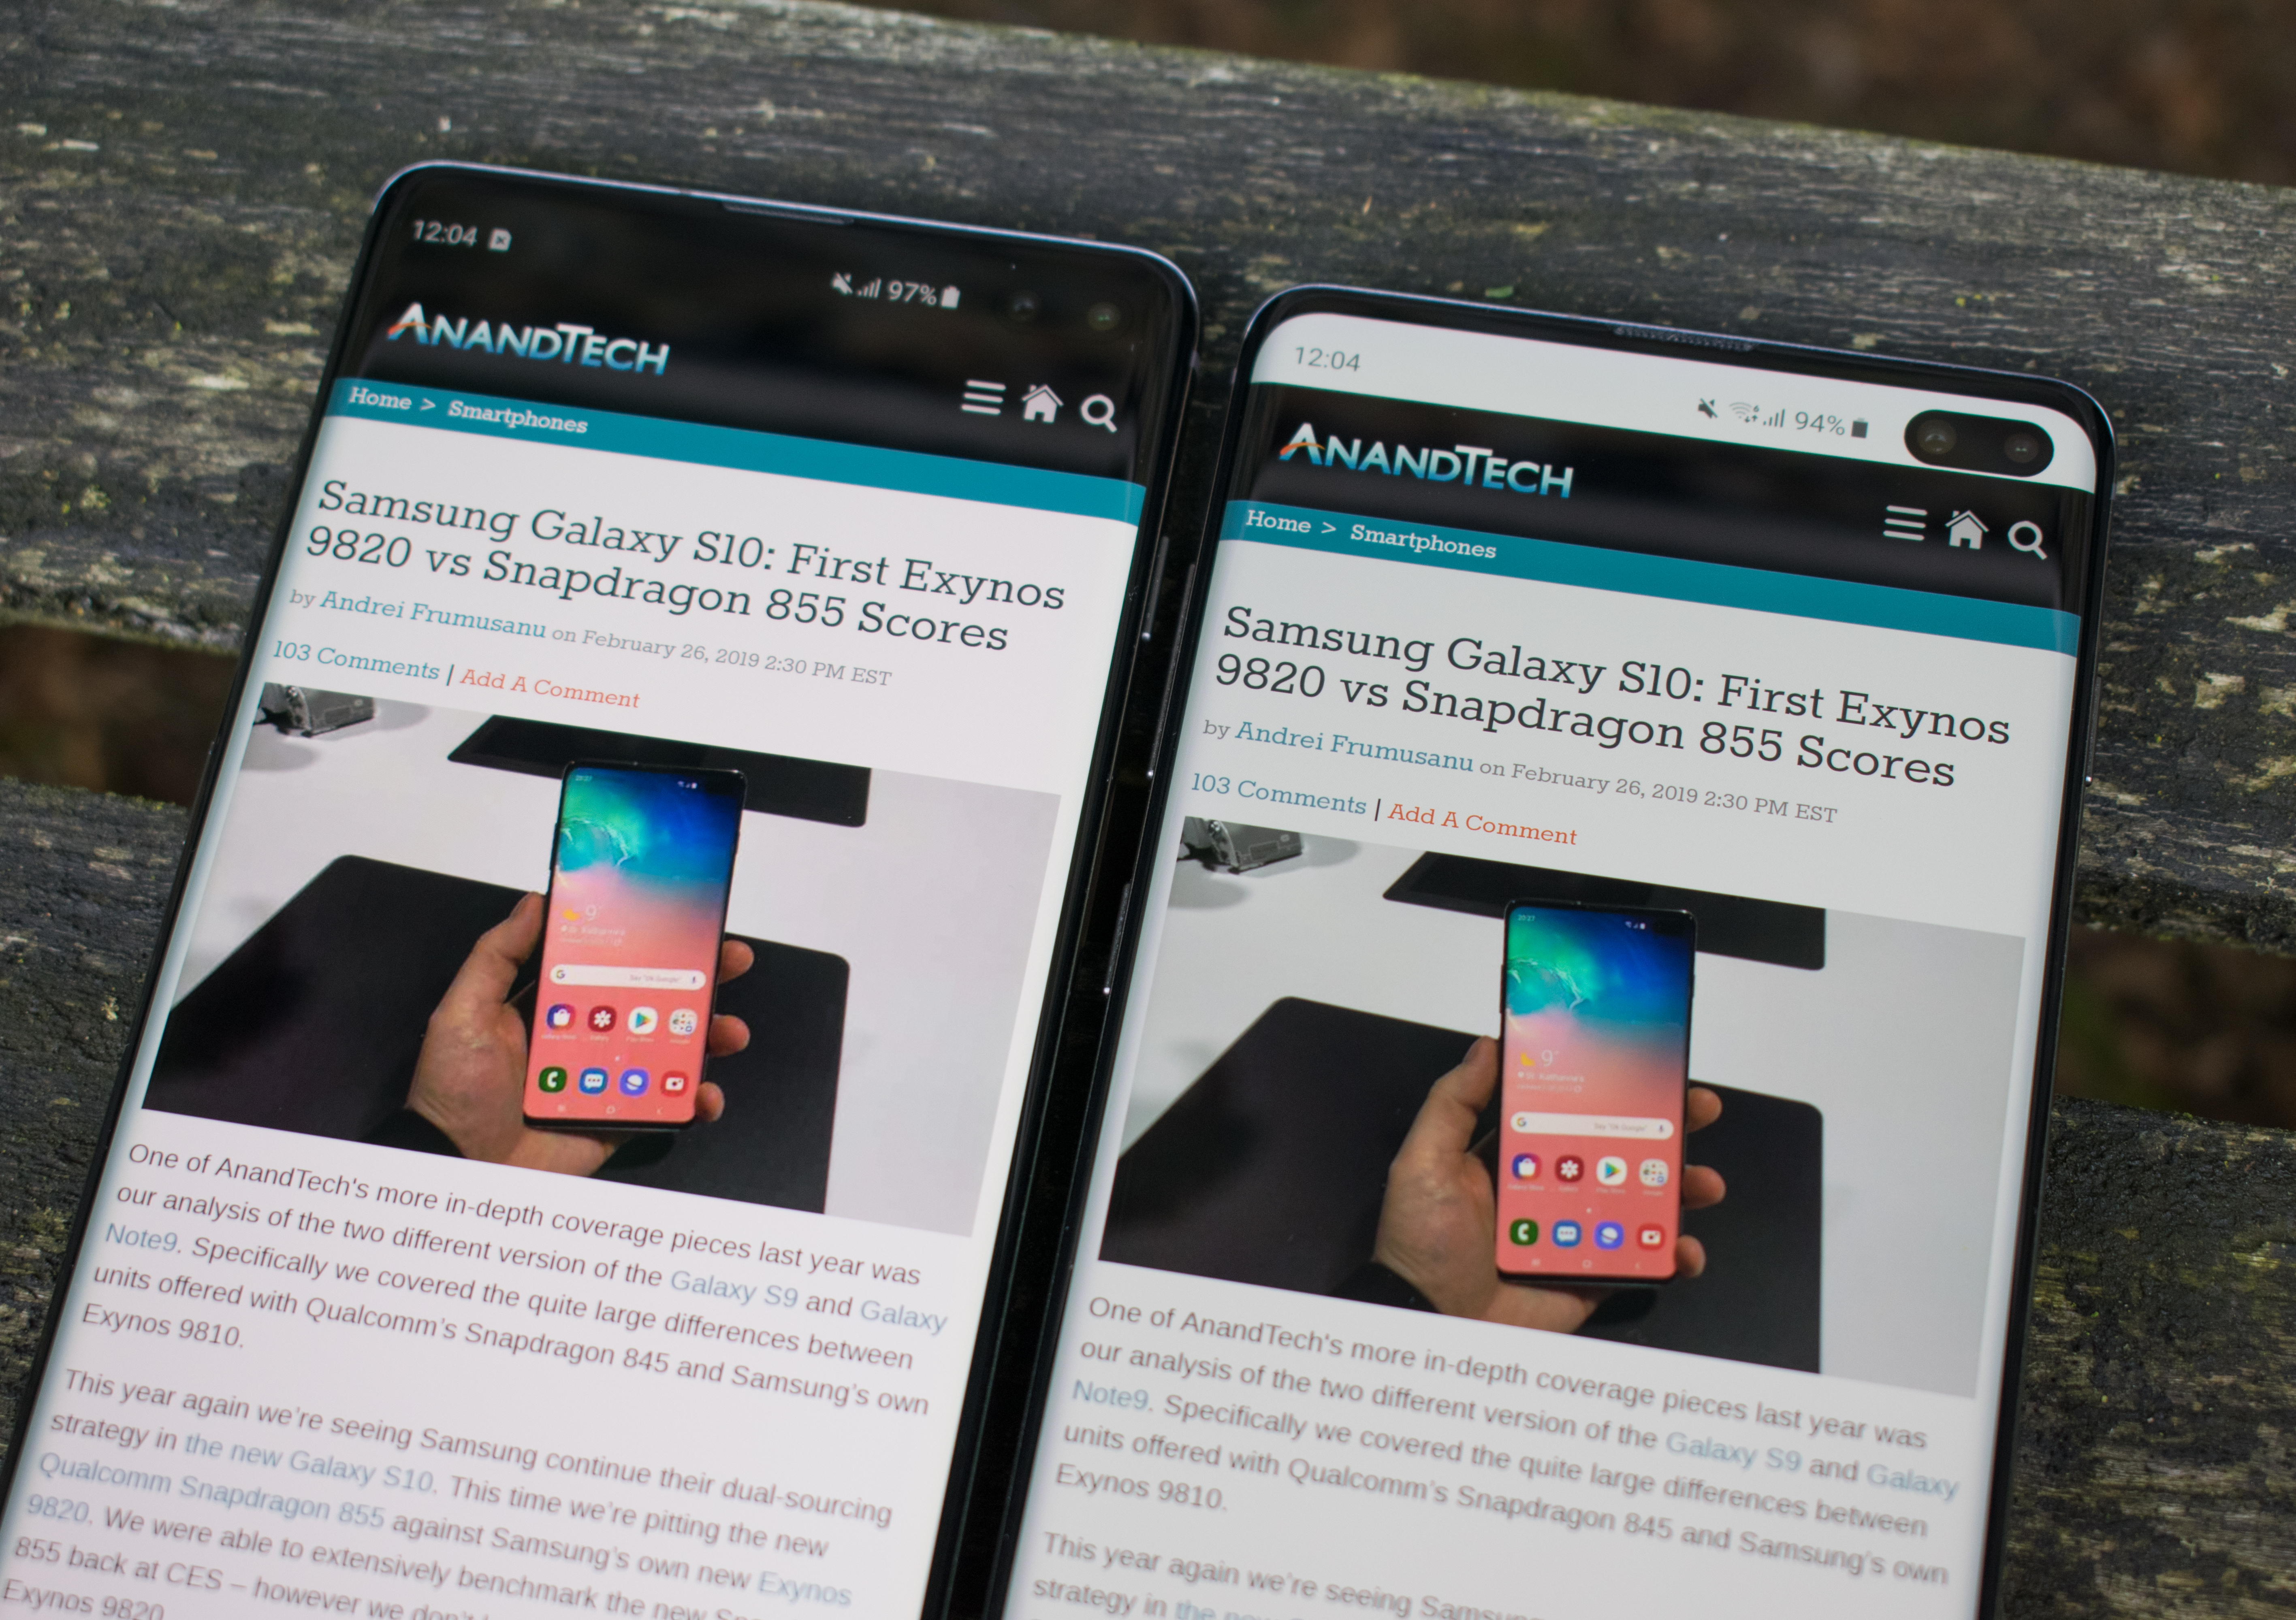 Design & Ergonomics - The Samsung Galaxy S10+ Snapdragon